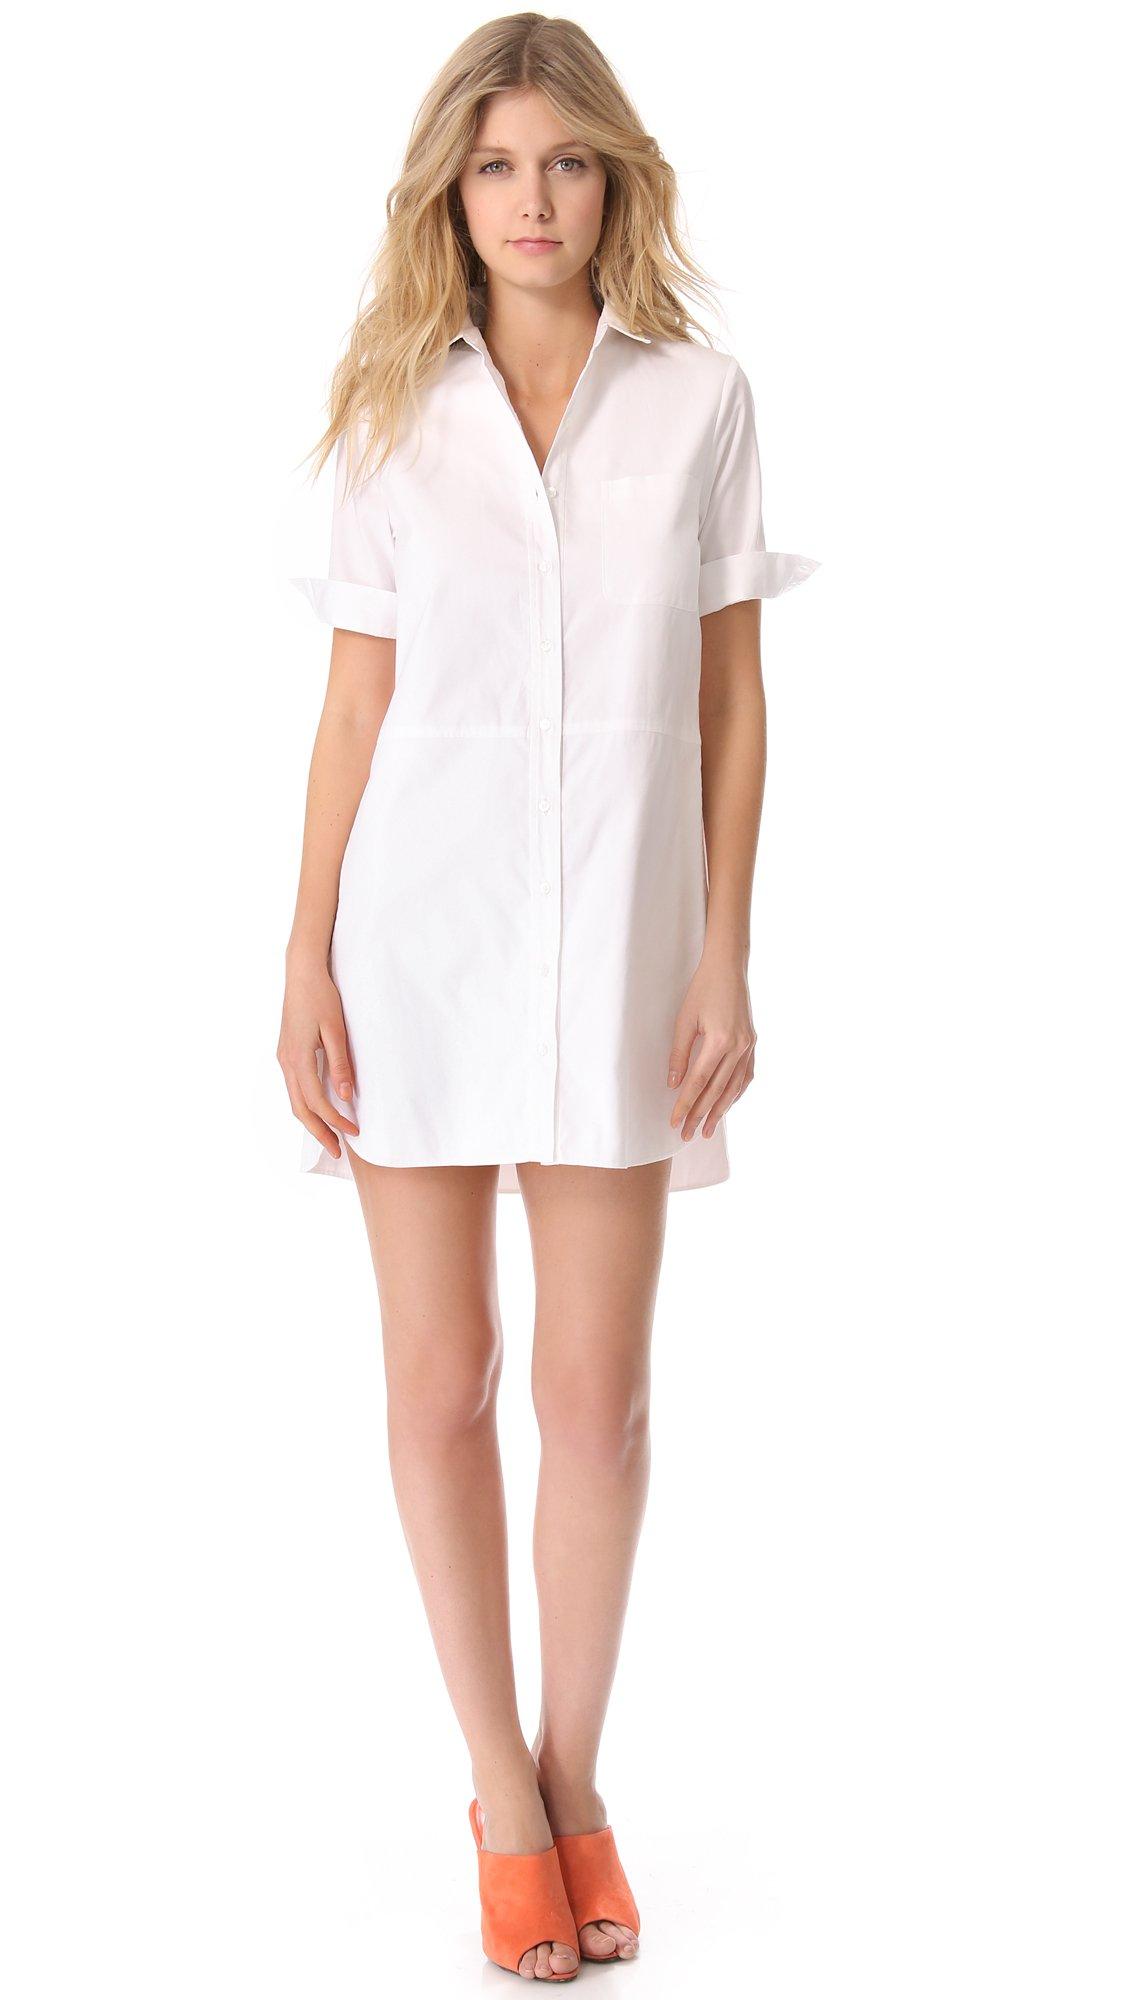 Lyst jenni kayne short sleeve shirt dress in white for Short sleeve white dress shirt